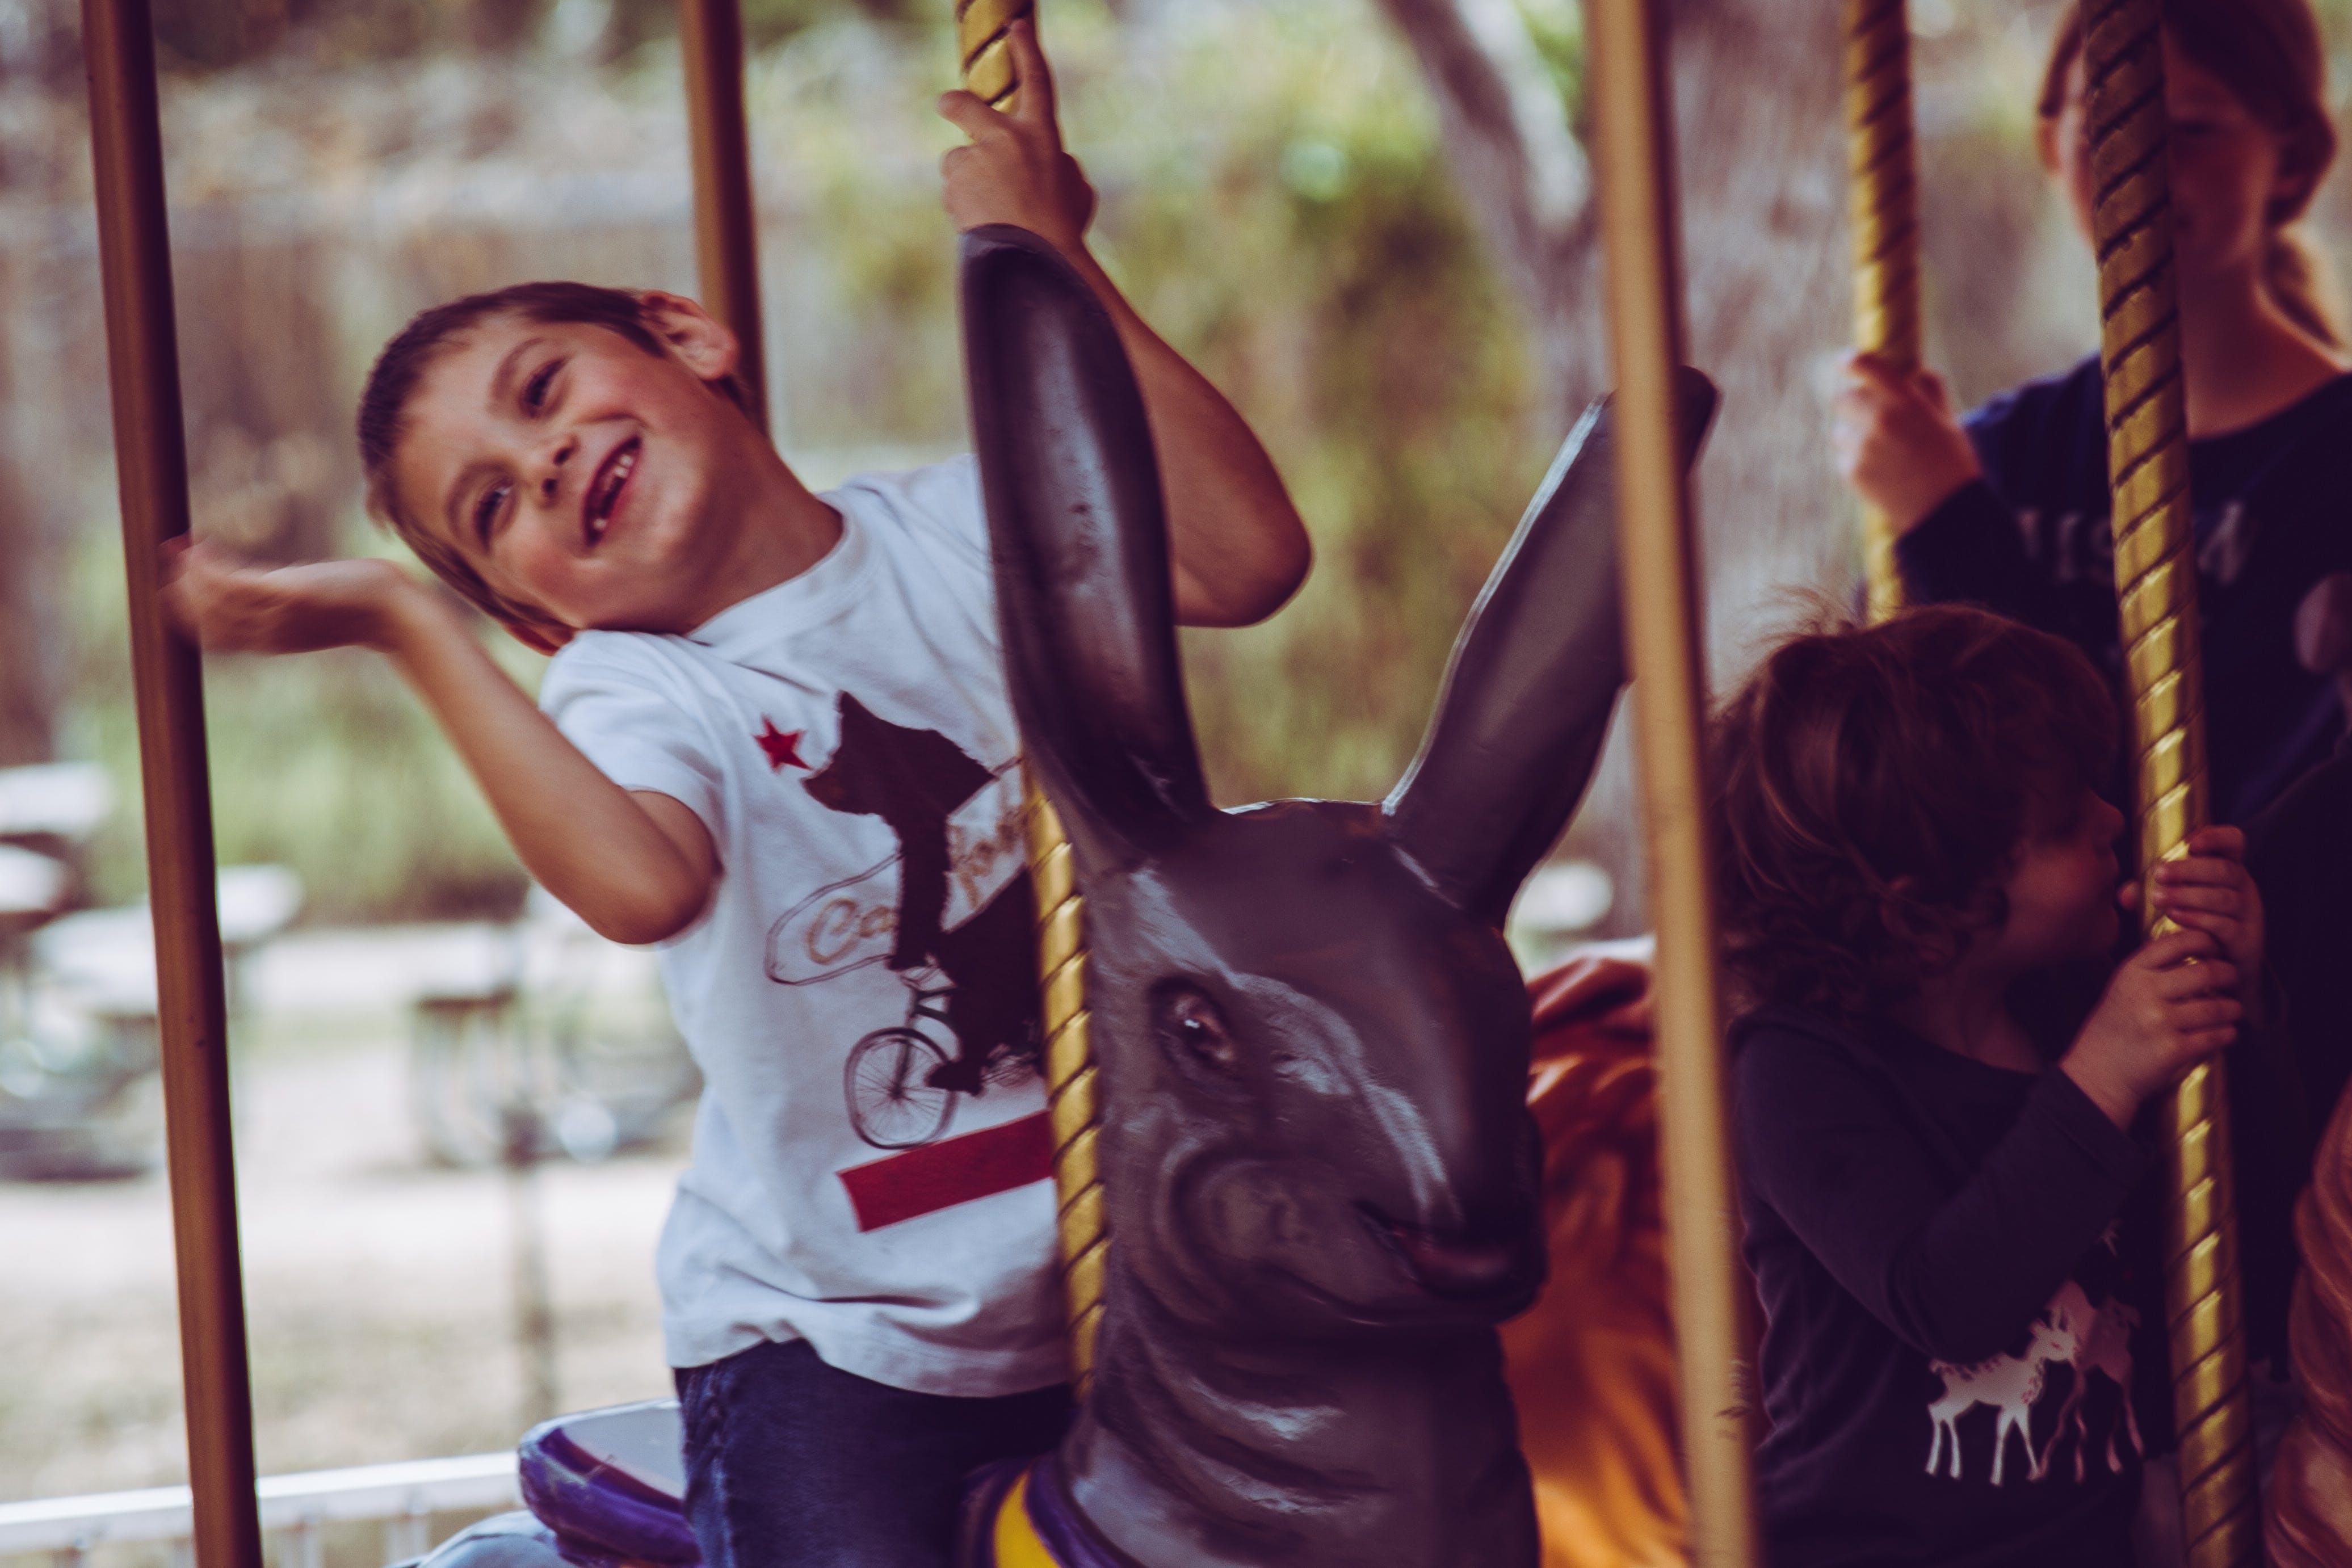 Boy in White T-shirt Riding Carousel